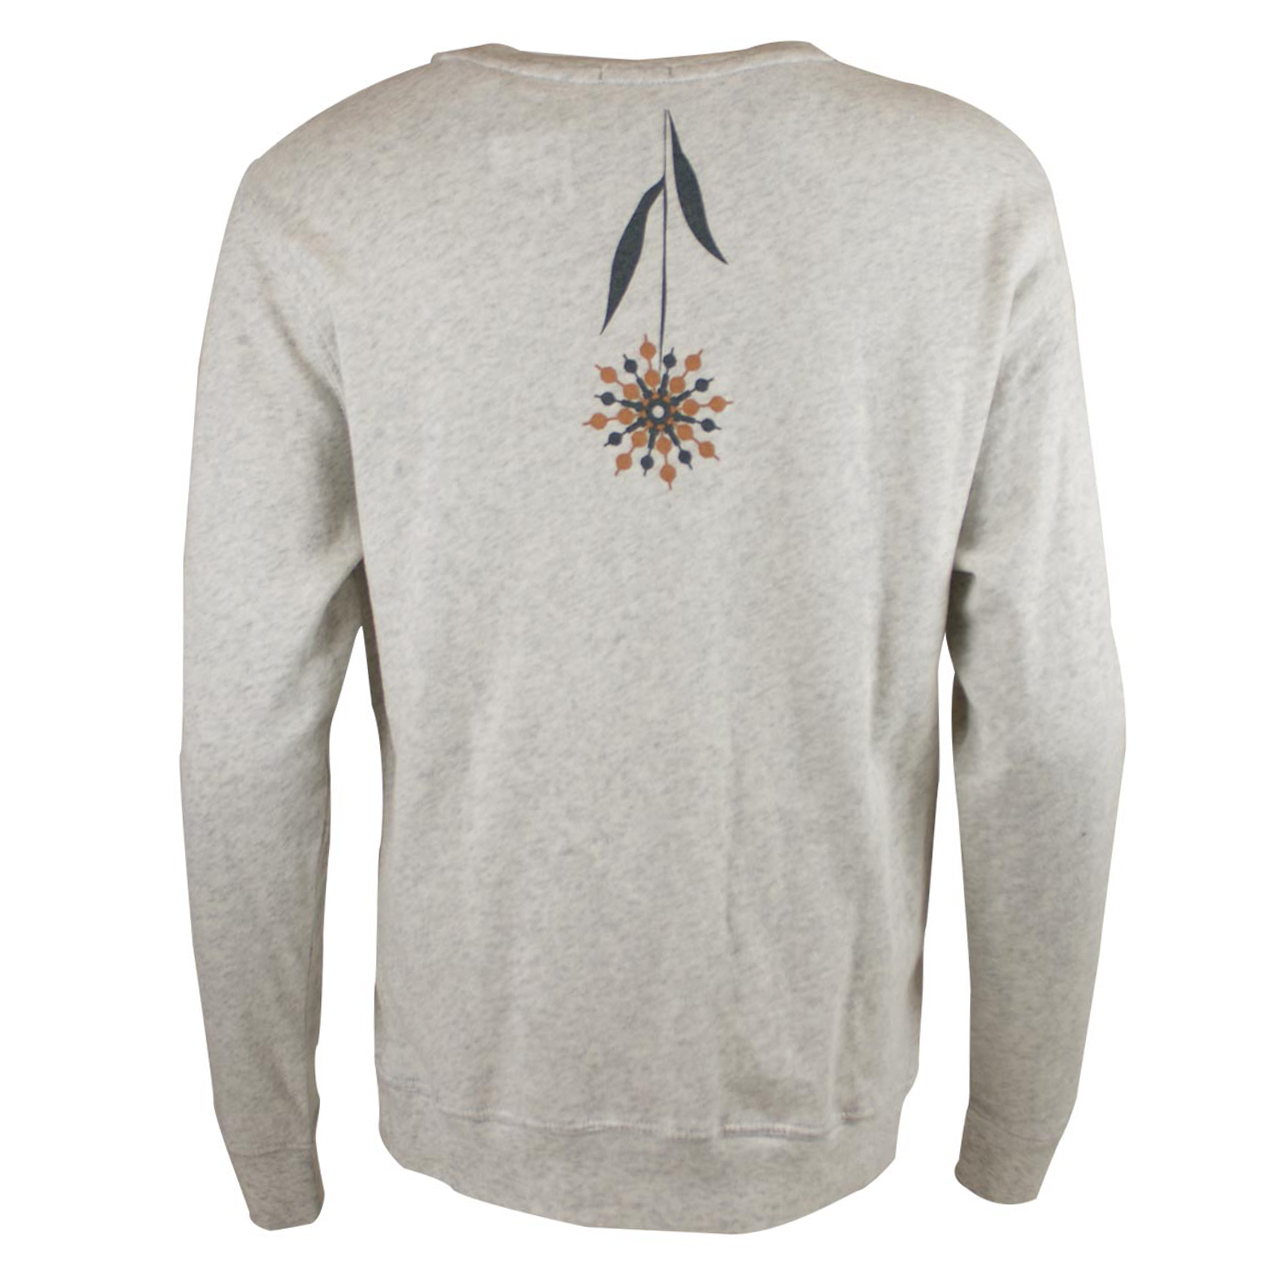 Sweatshirtt Fernsehturm Blumen hell-grau